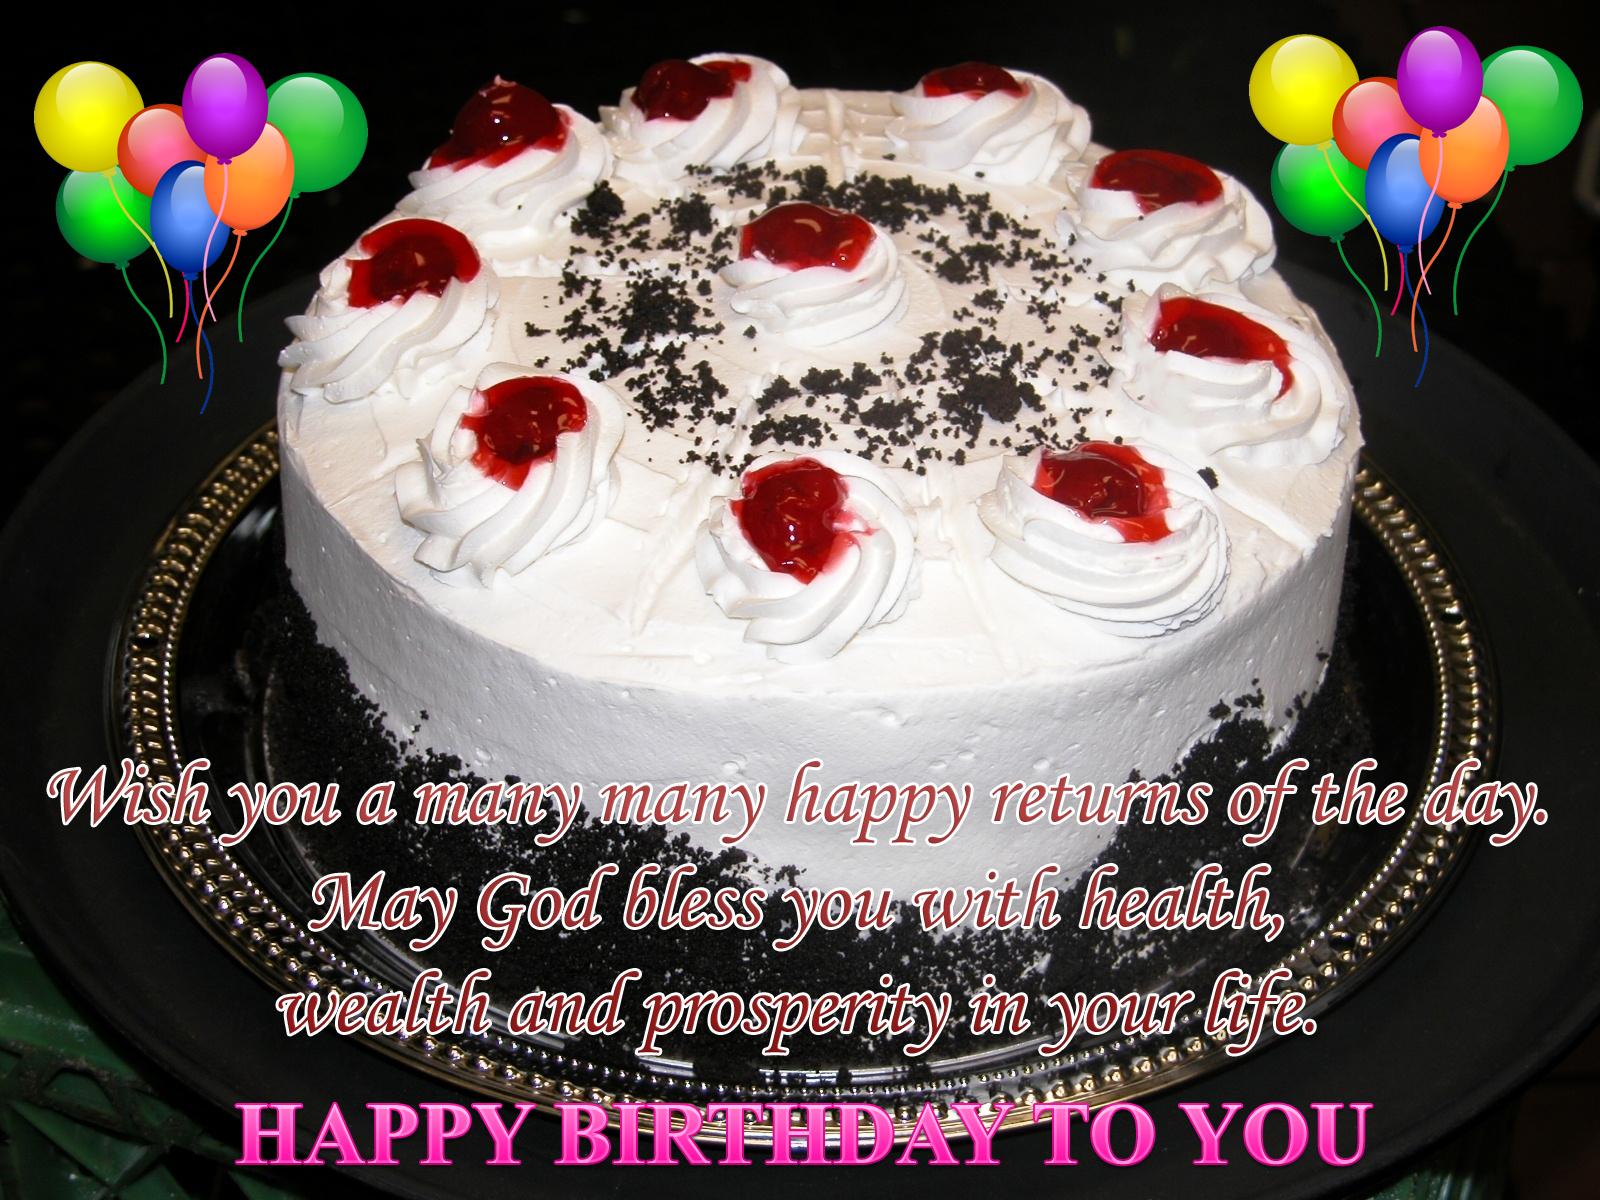 Birthday Wishes 101 1600x1200